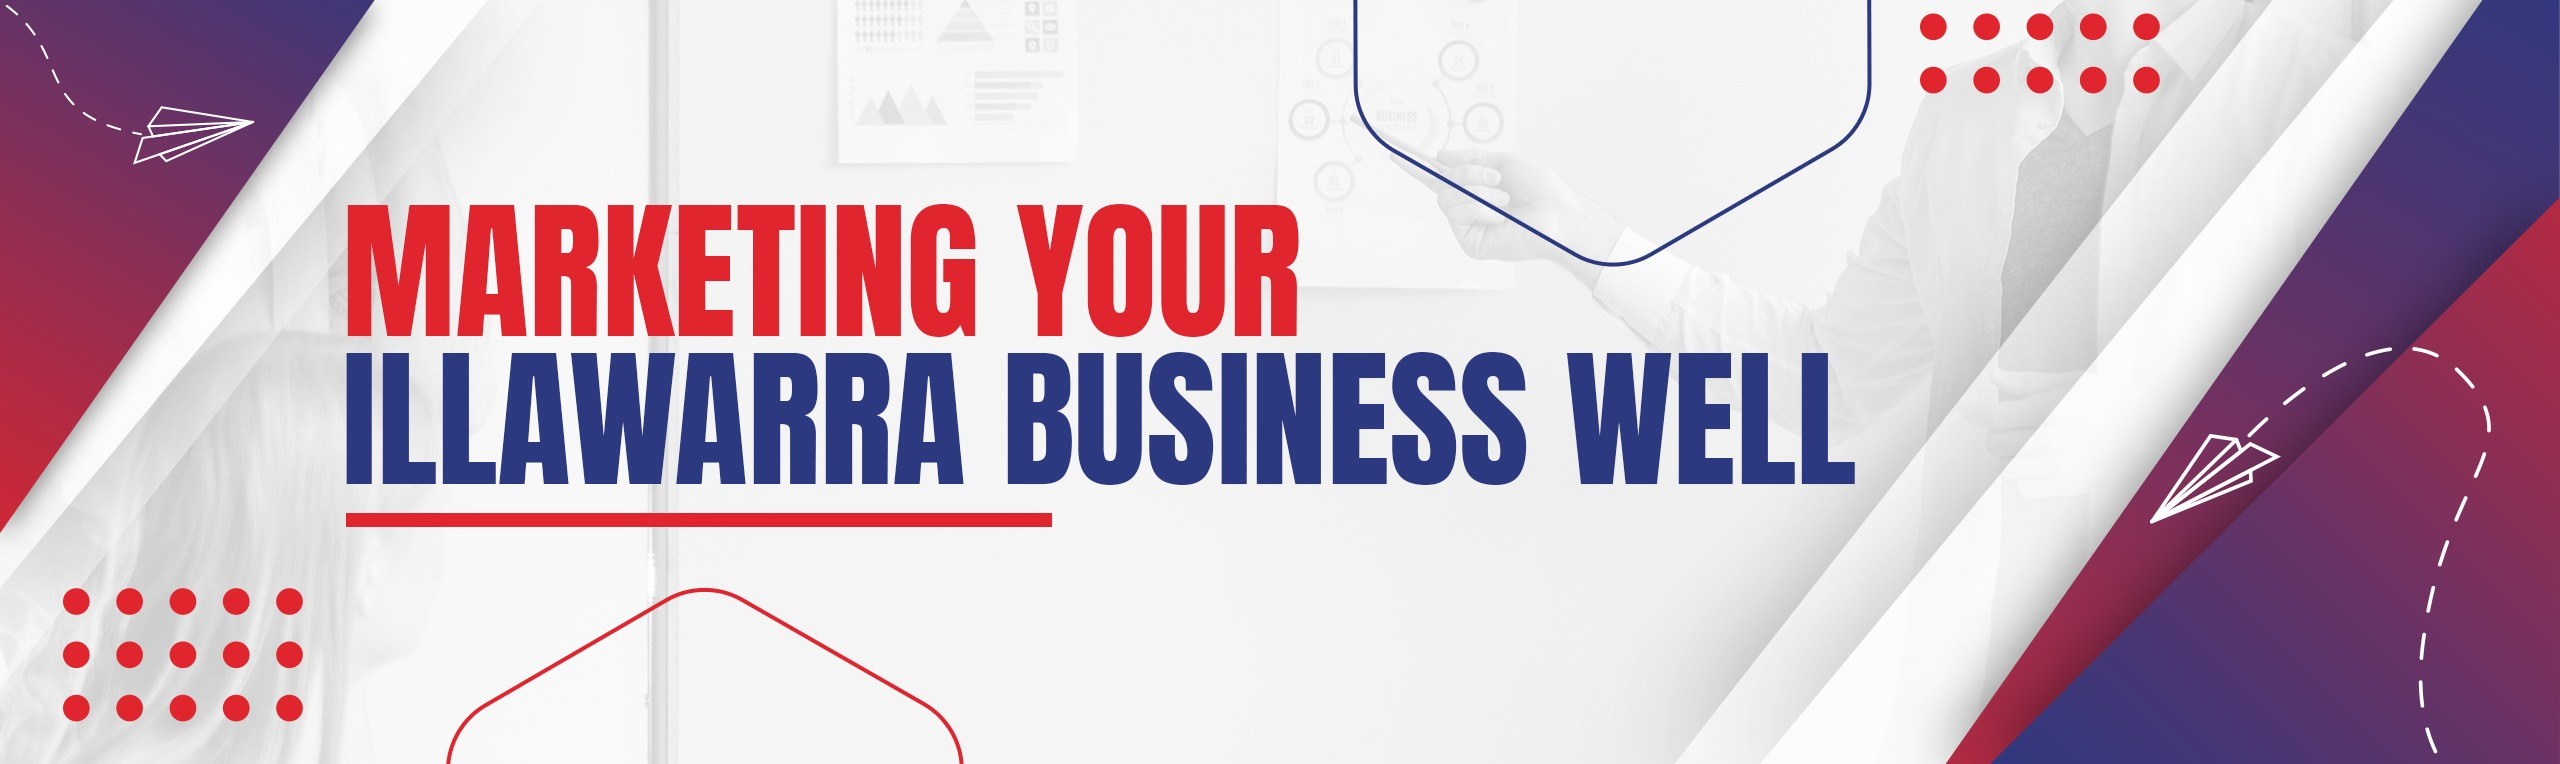 Marketing your Illawarra Business well-v1